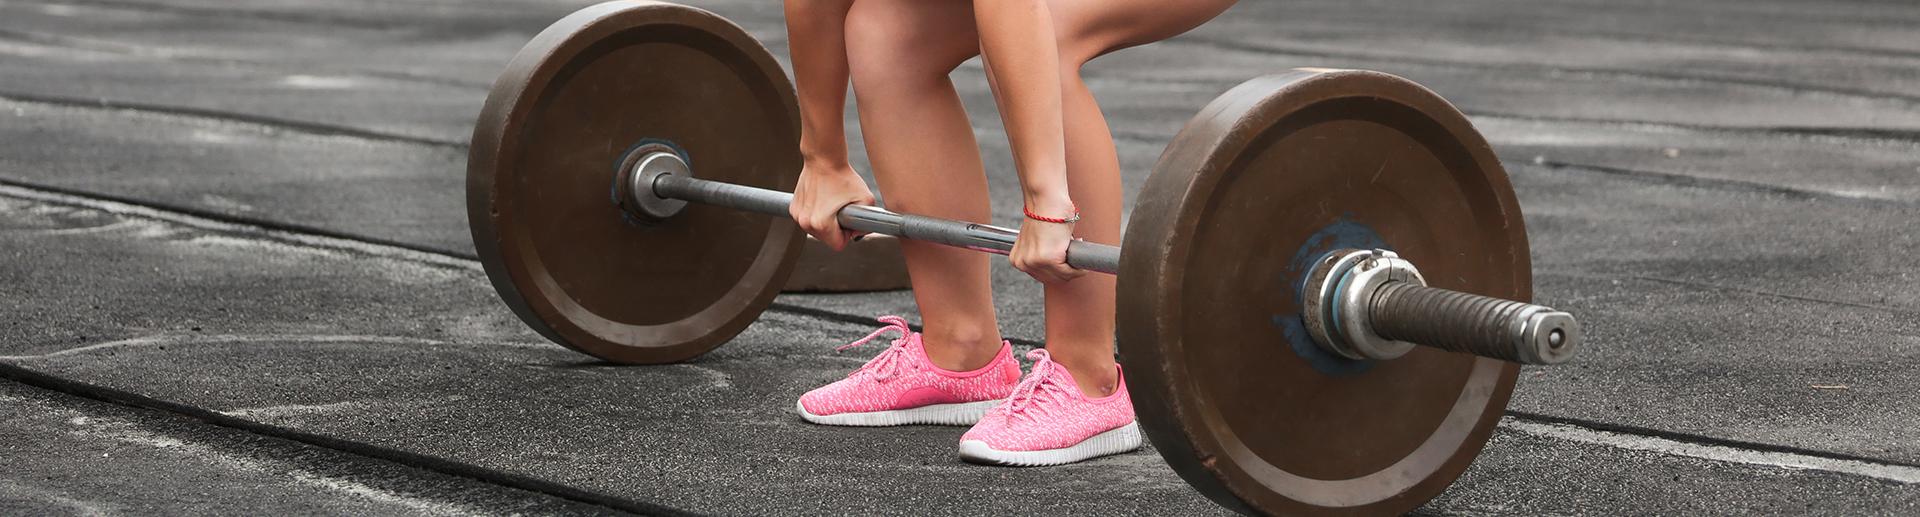 Fitness / Crossfit / Yoga